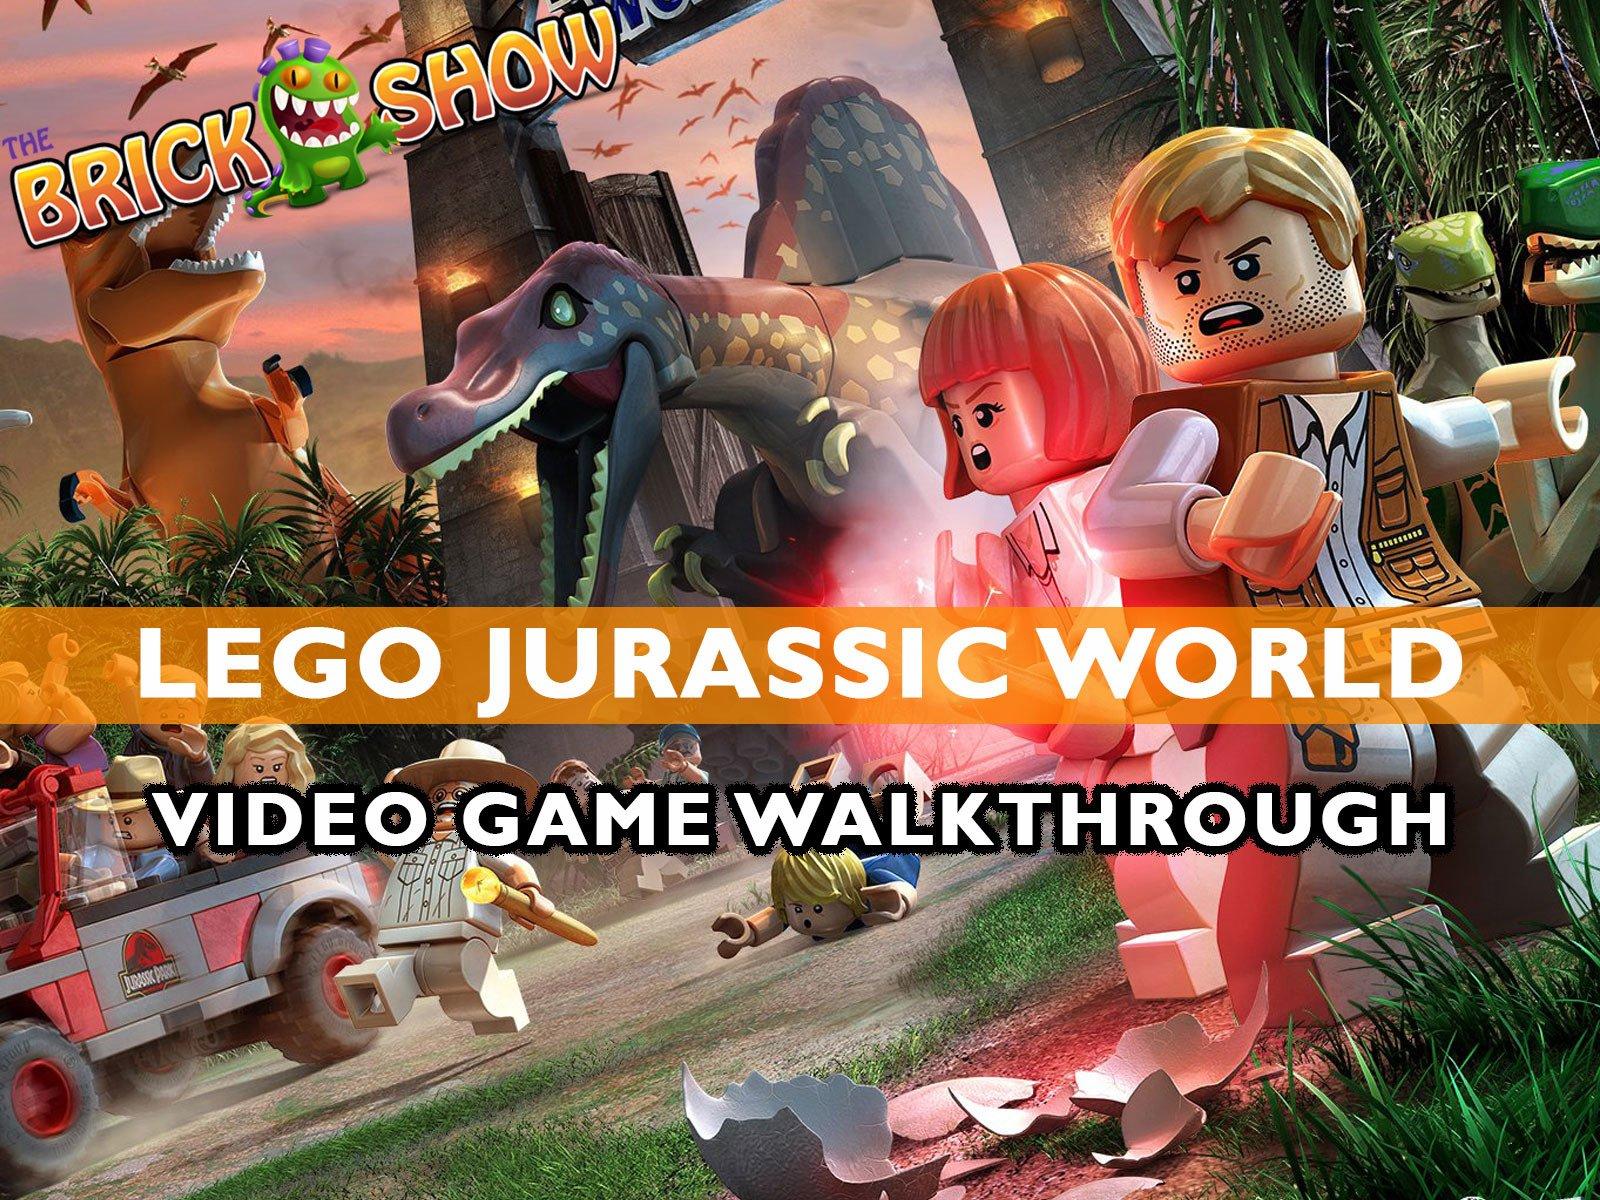 Amazon clip lego jurassic world video game walkthrough jason amazon clip lego jurassic world video game walkthrough jason forthofer amazon digital services llc gumiabroncs Choice Image